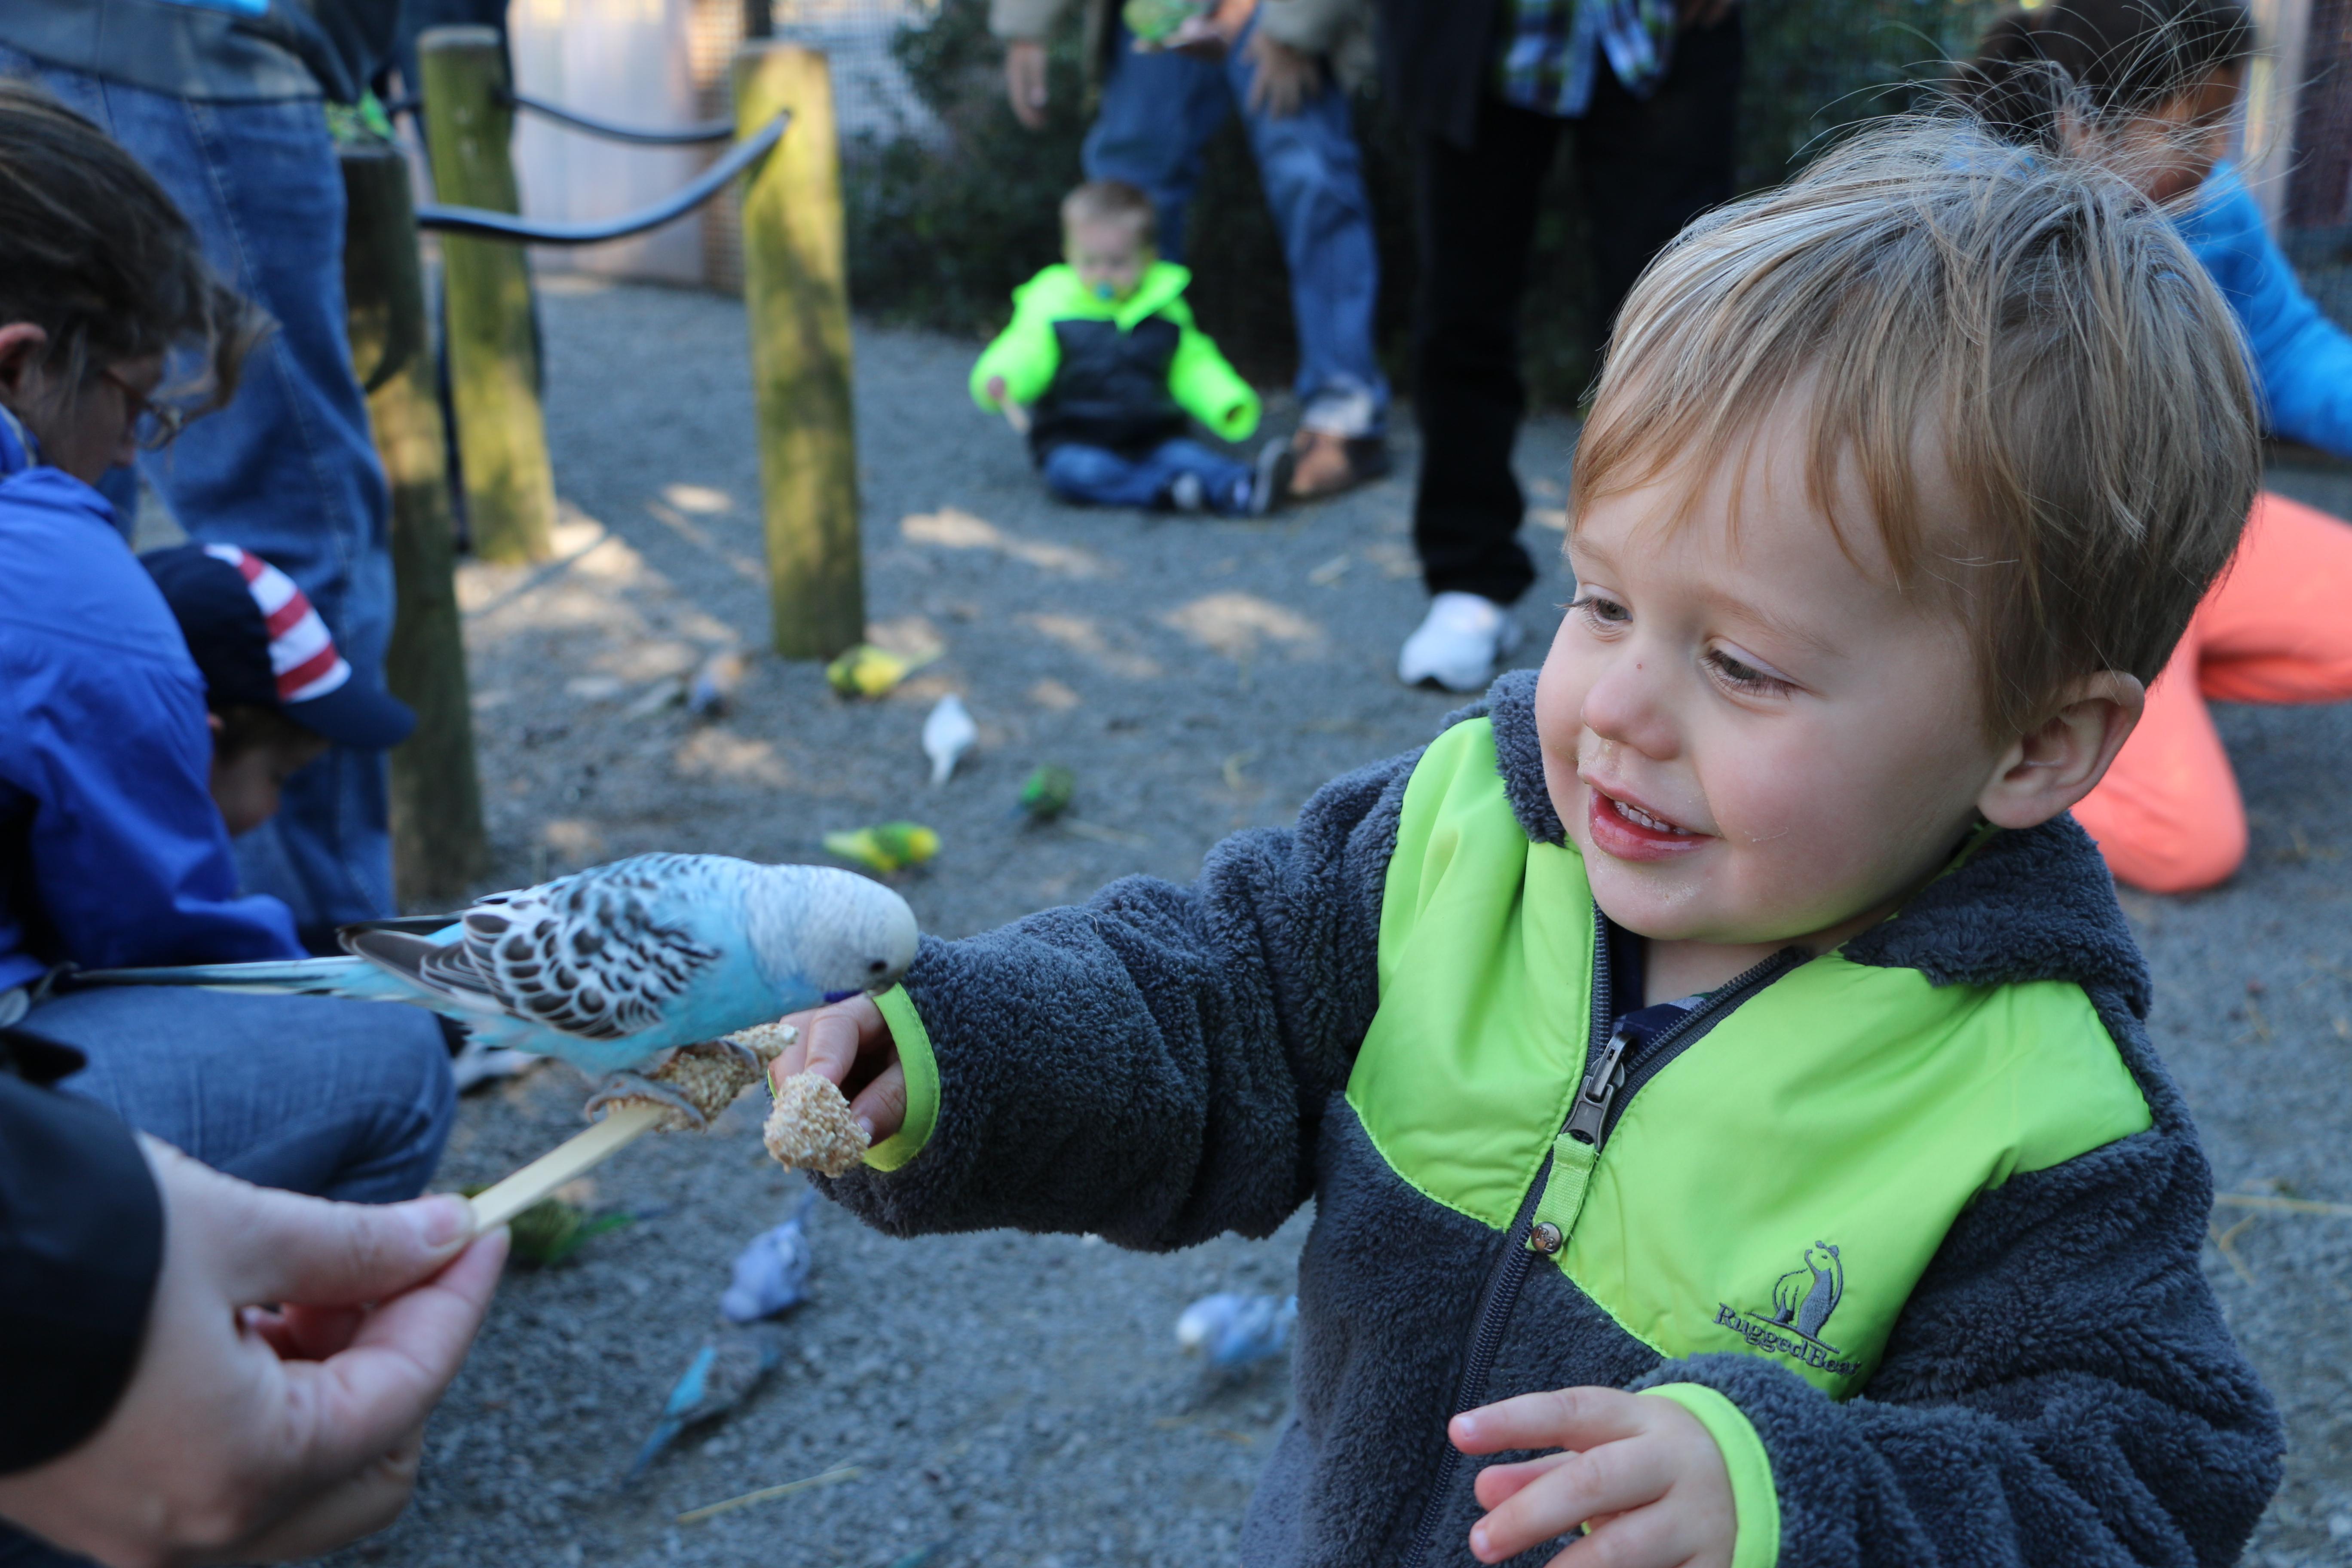 Treats, Not Tricks, at the Zoo